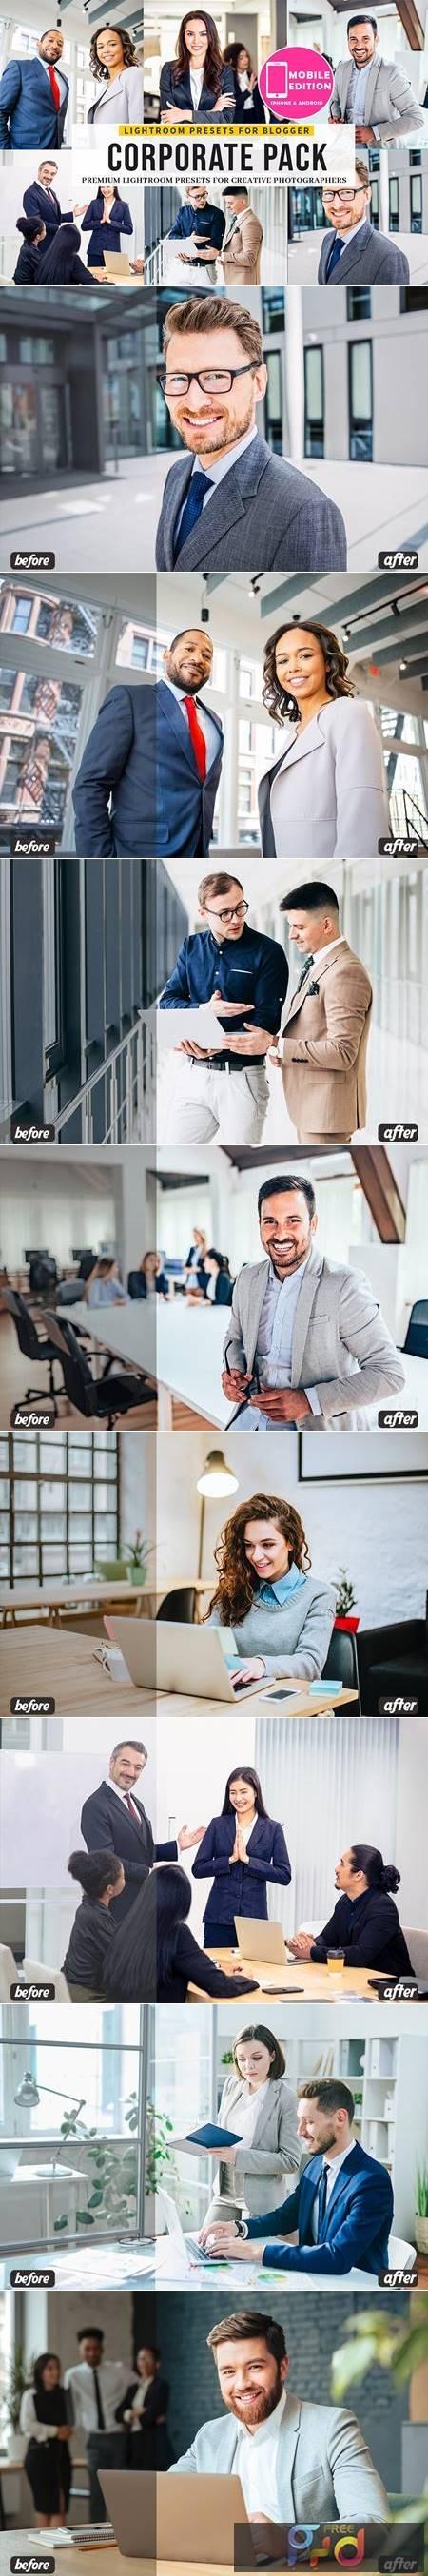 Corporate Lightroom Presets 5346768 1